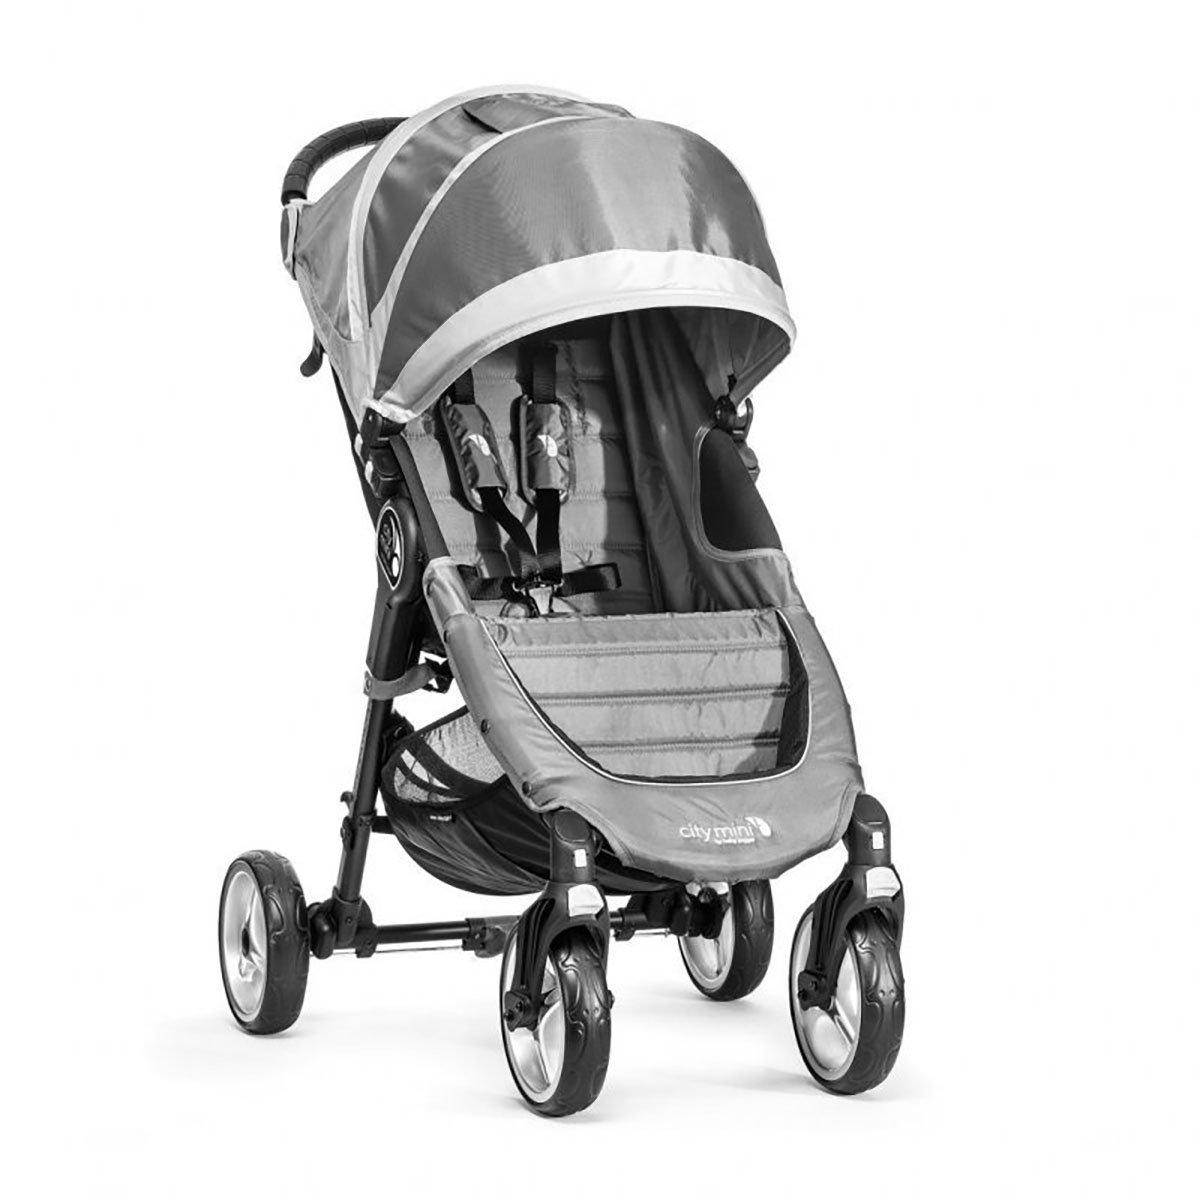 Carucior Baby Jogger City Mini 4, Steel Grey, Sand